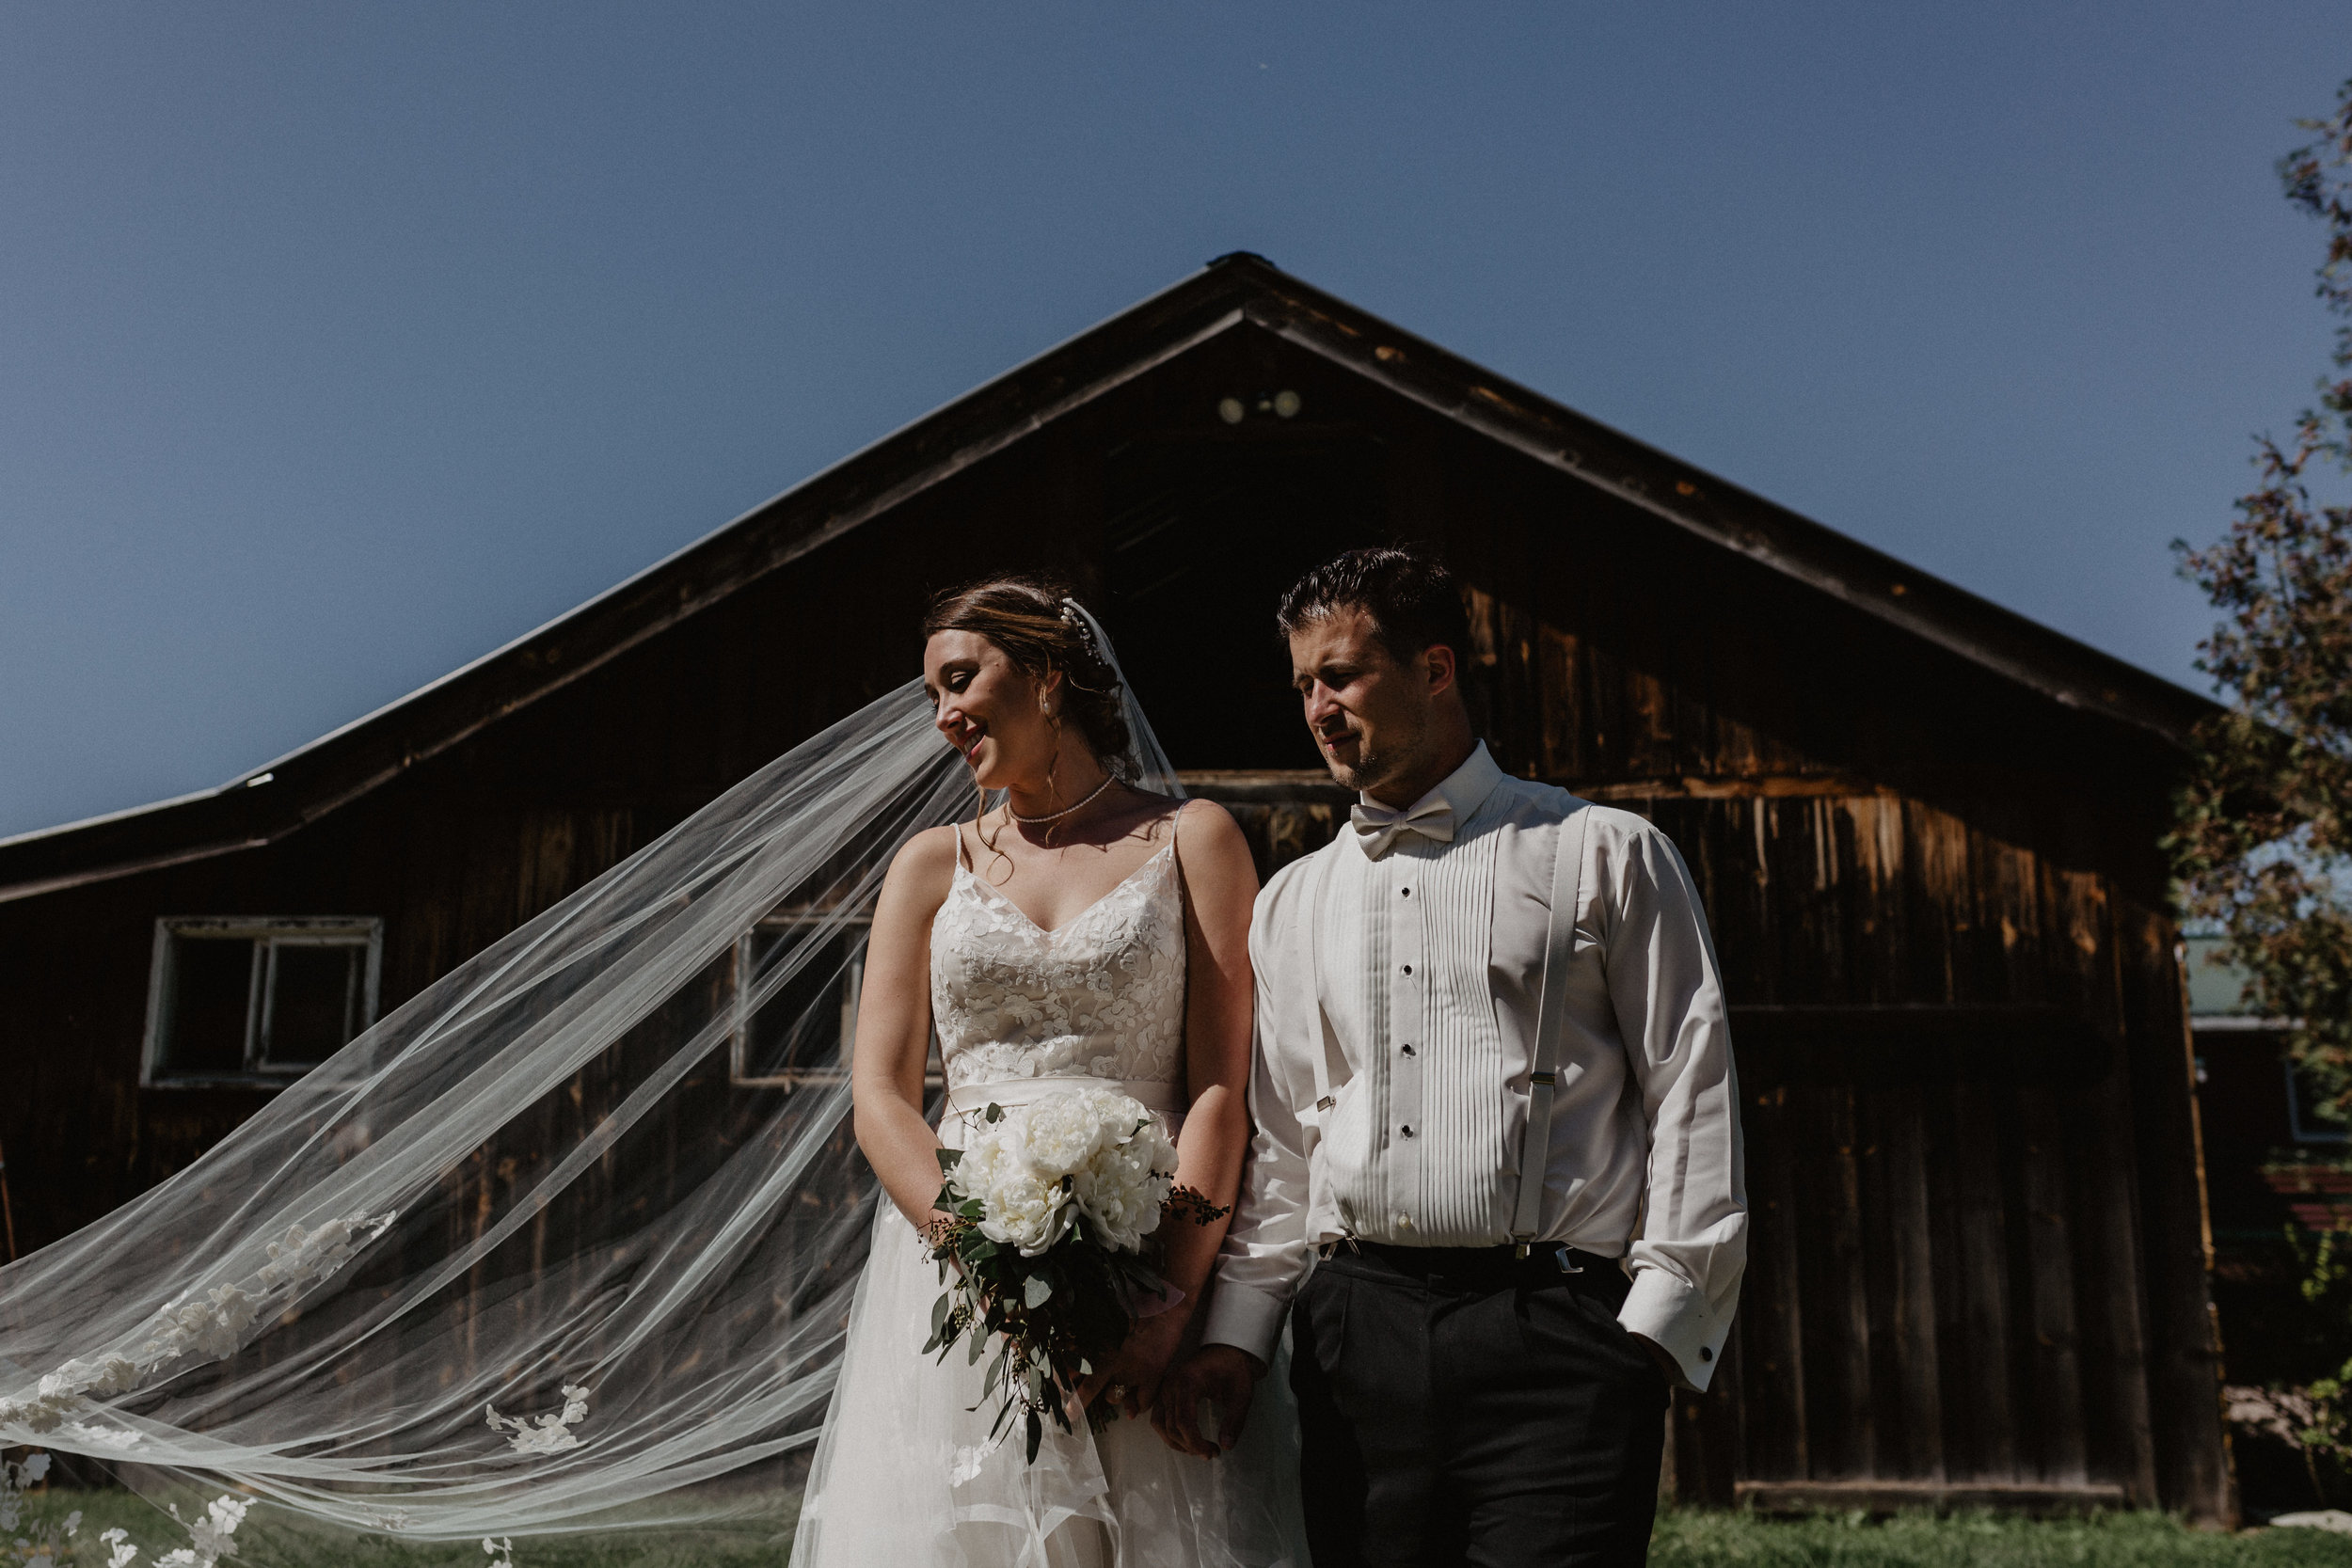 upstate_ny_wedding-57.jpg